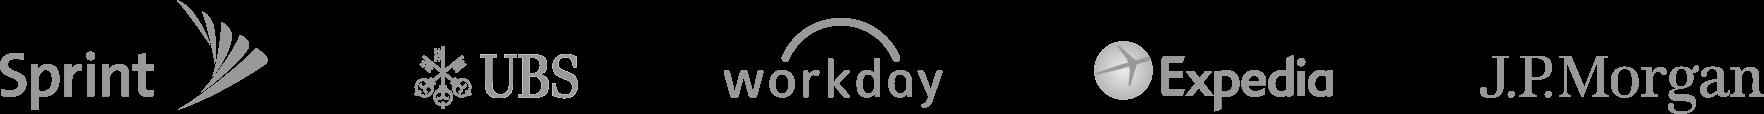 Logos da Sprint, UBS, Workday, Expedia e J.P. Morgan